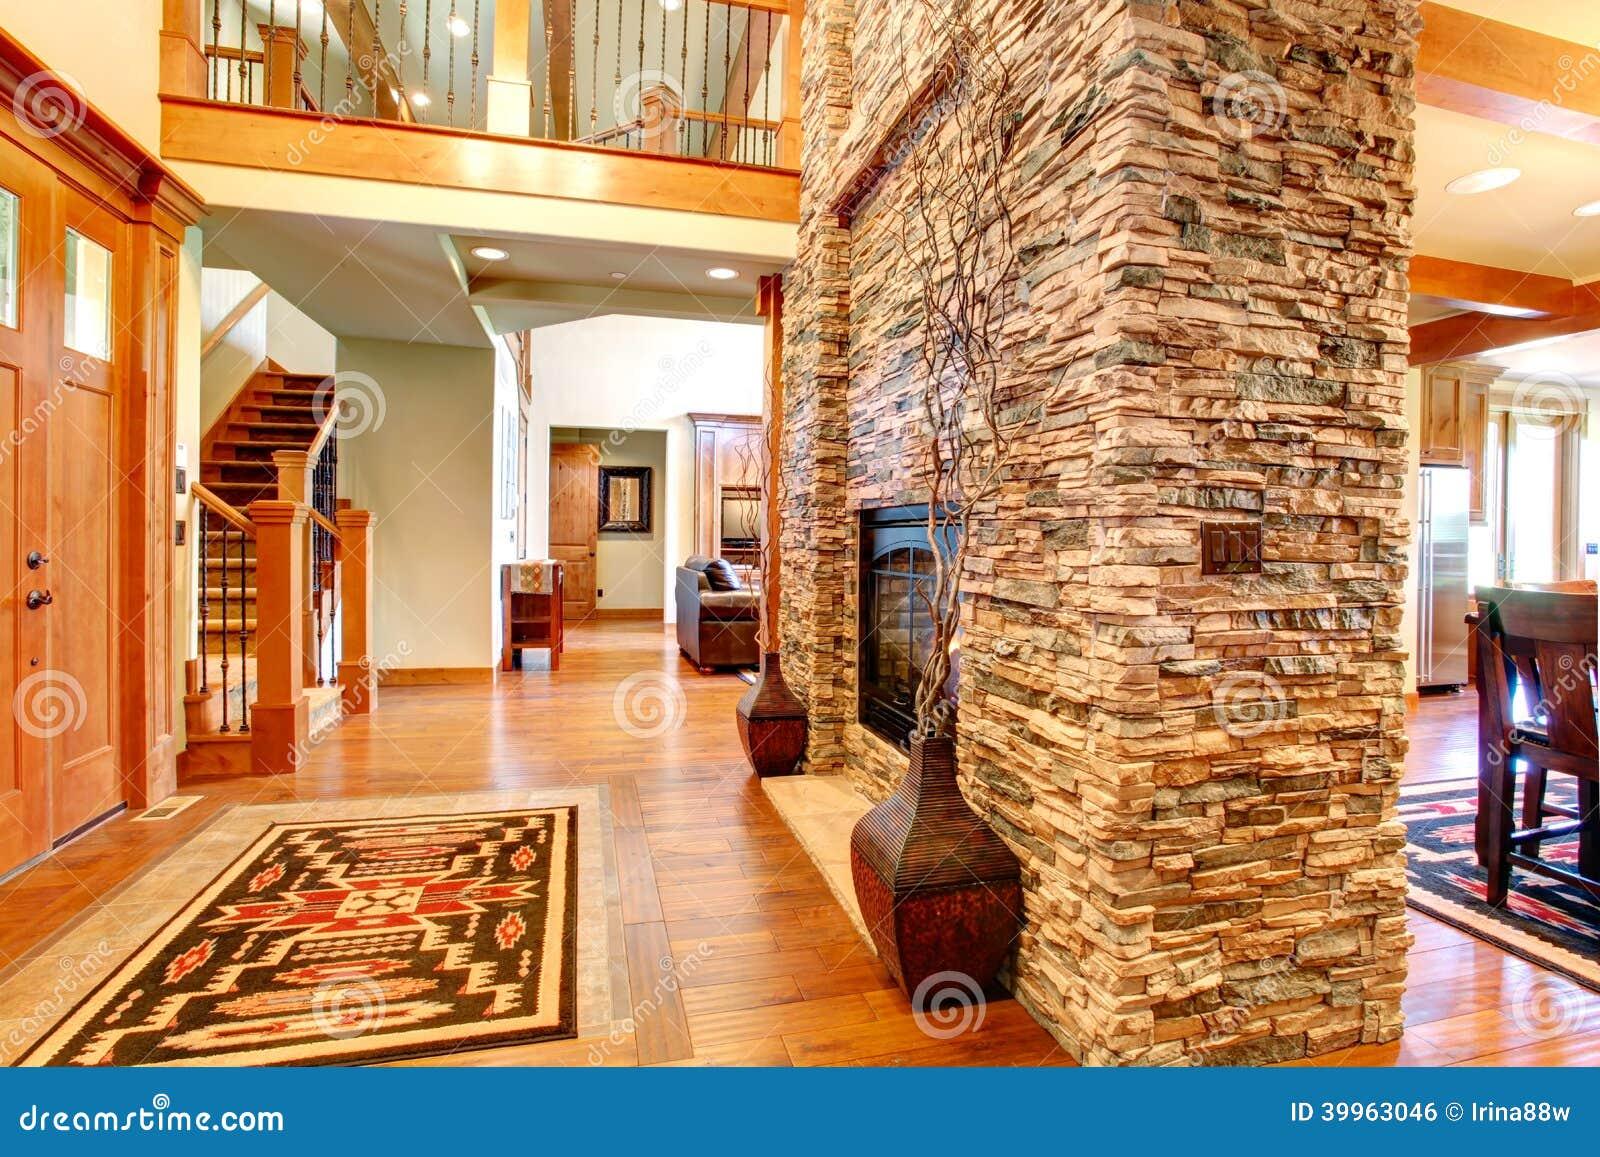 Luxury house interior stone wall with fireplace stock - Pared interior de piedra ...